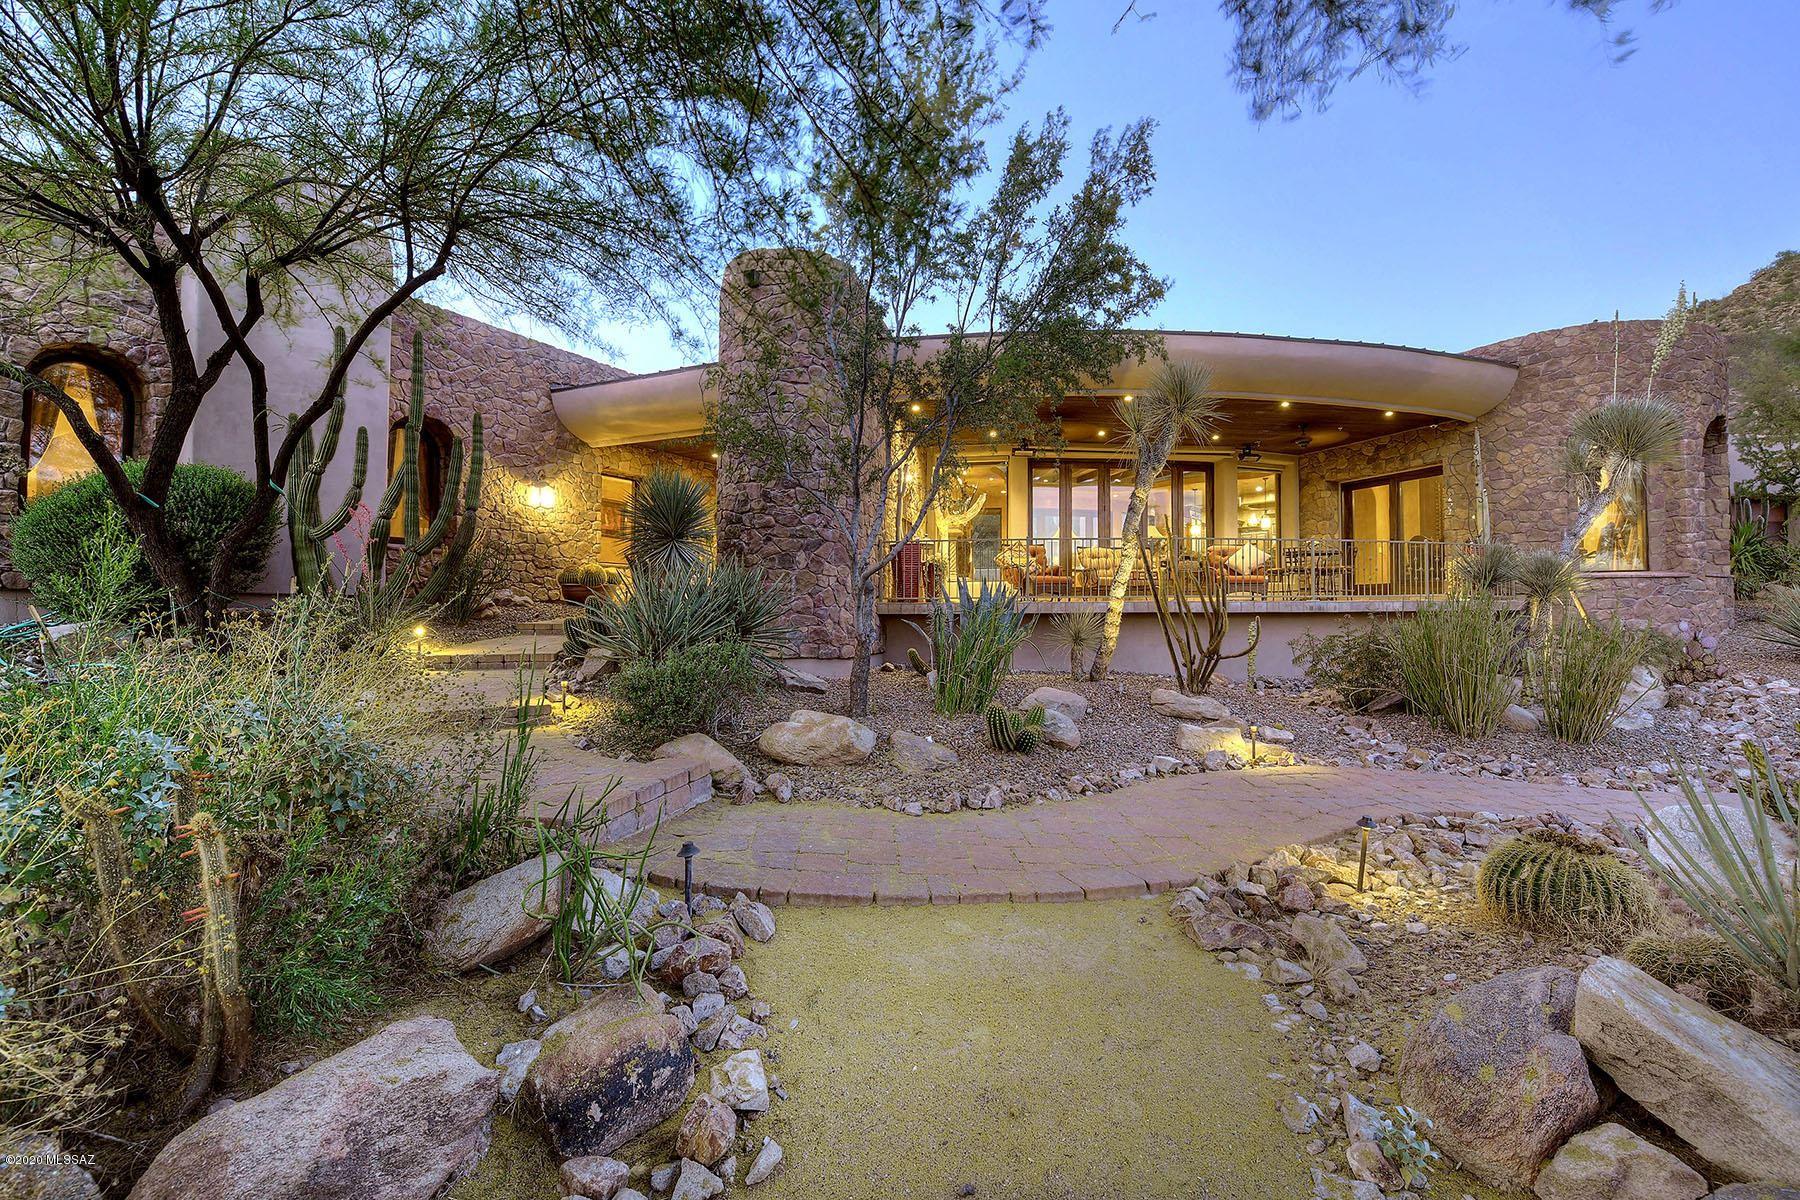 13971 N Jims Deadend Place, Marana, AZ 85658 - MLS#: 22115315